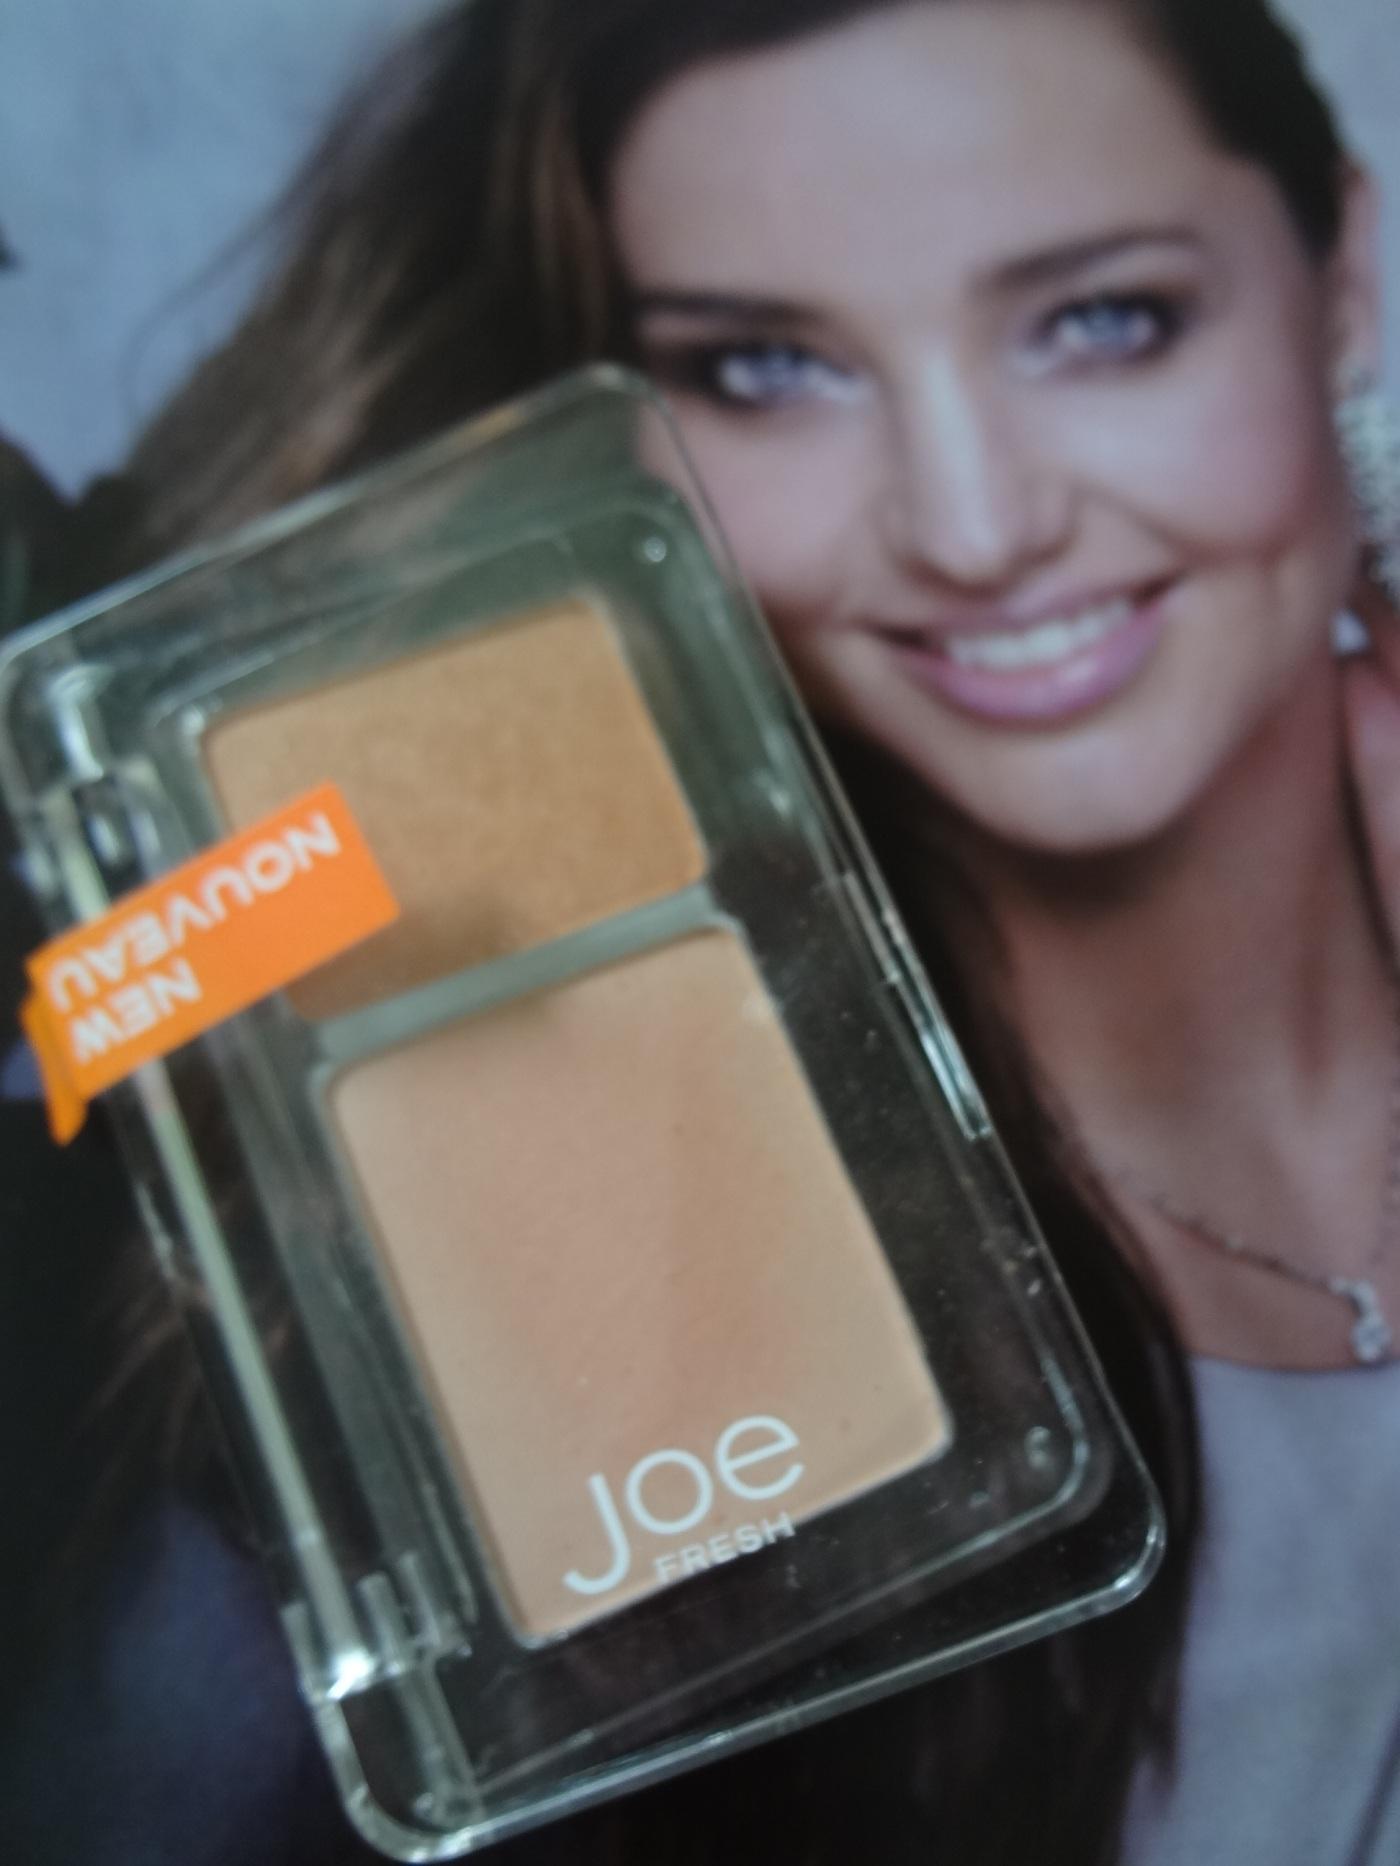 joe fresh duo eyeshadow